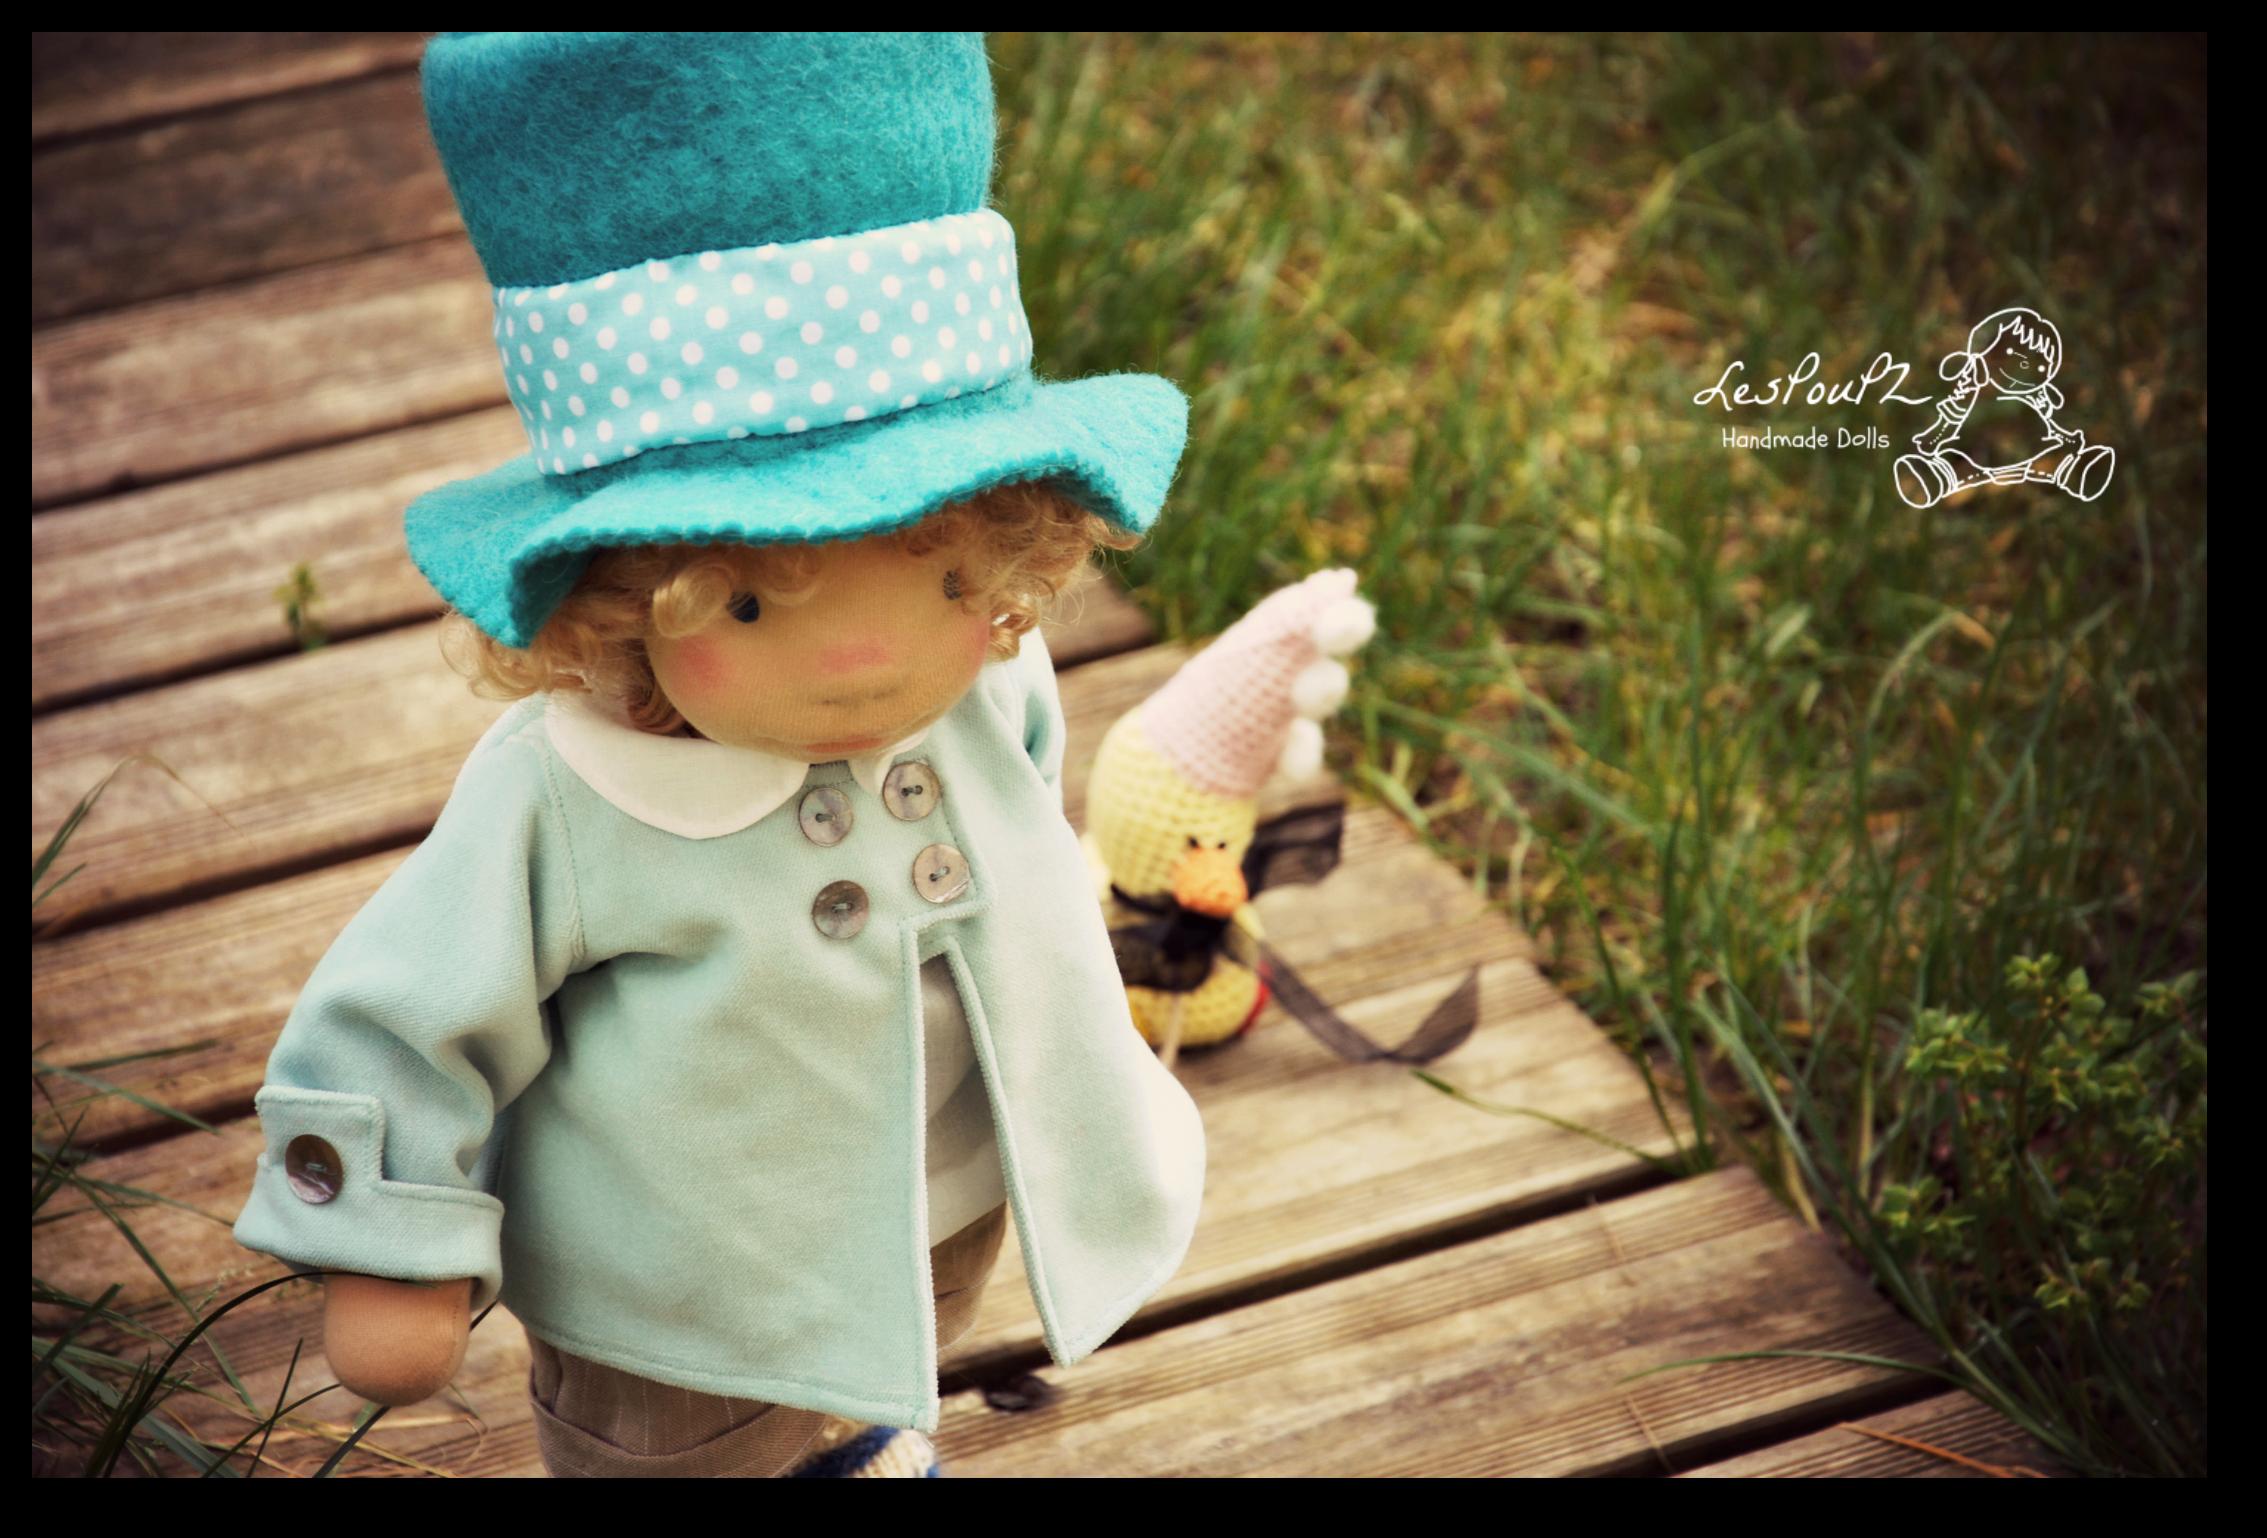 Monsieur Yvon and his duck friend